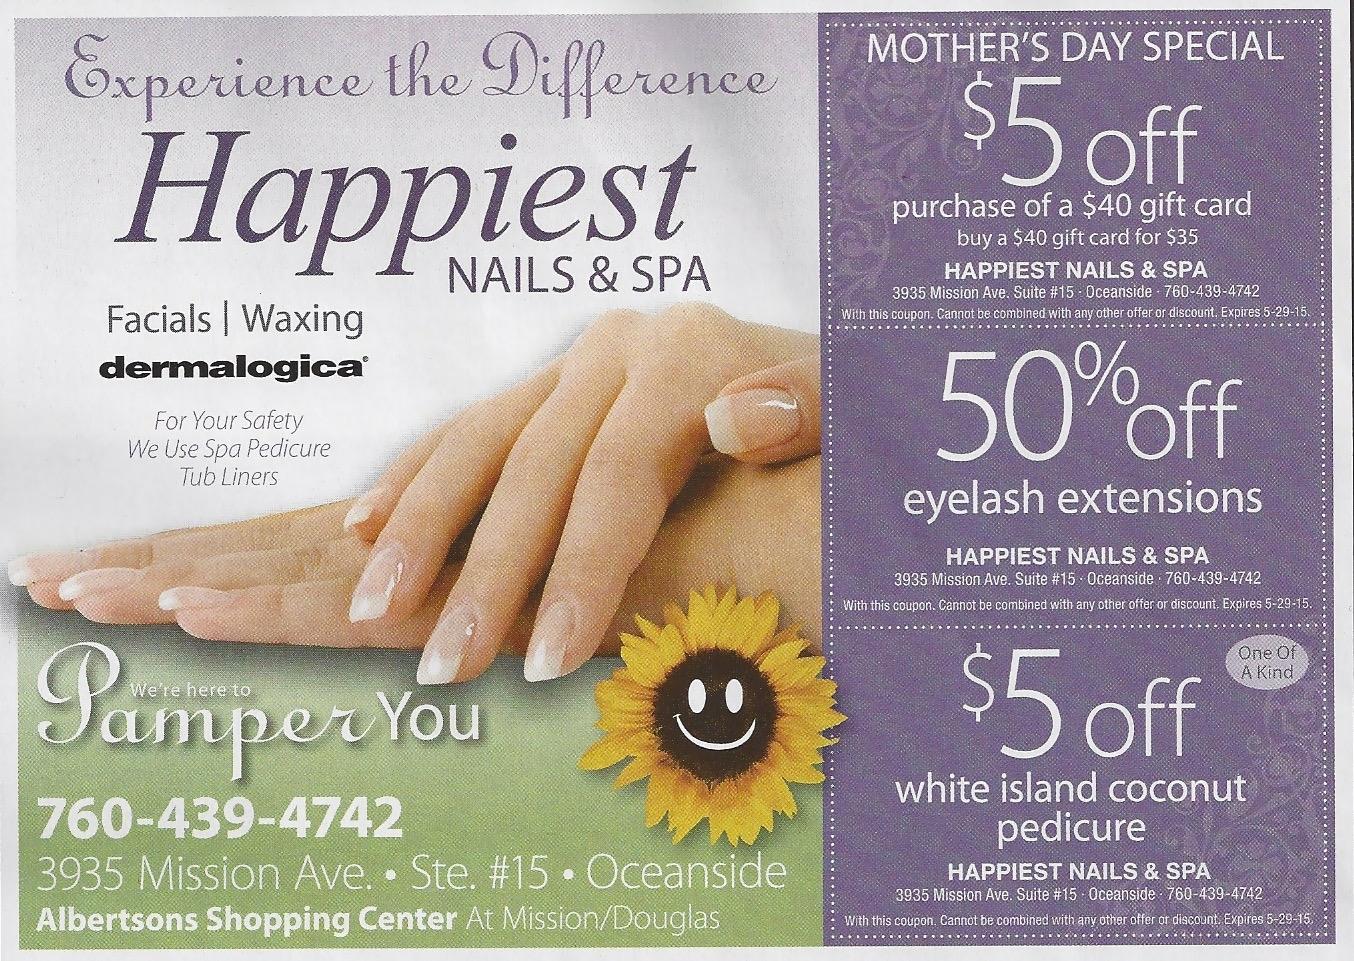 Happiest Nails & Spa